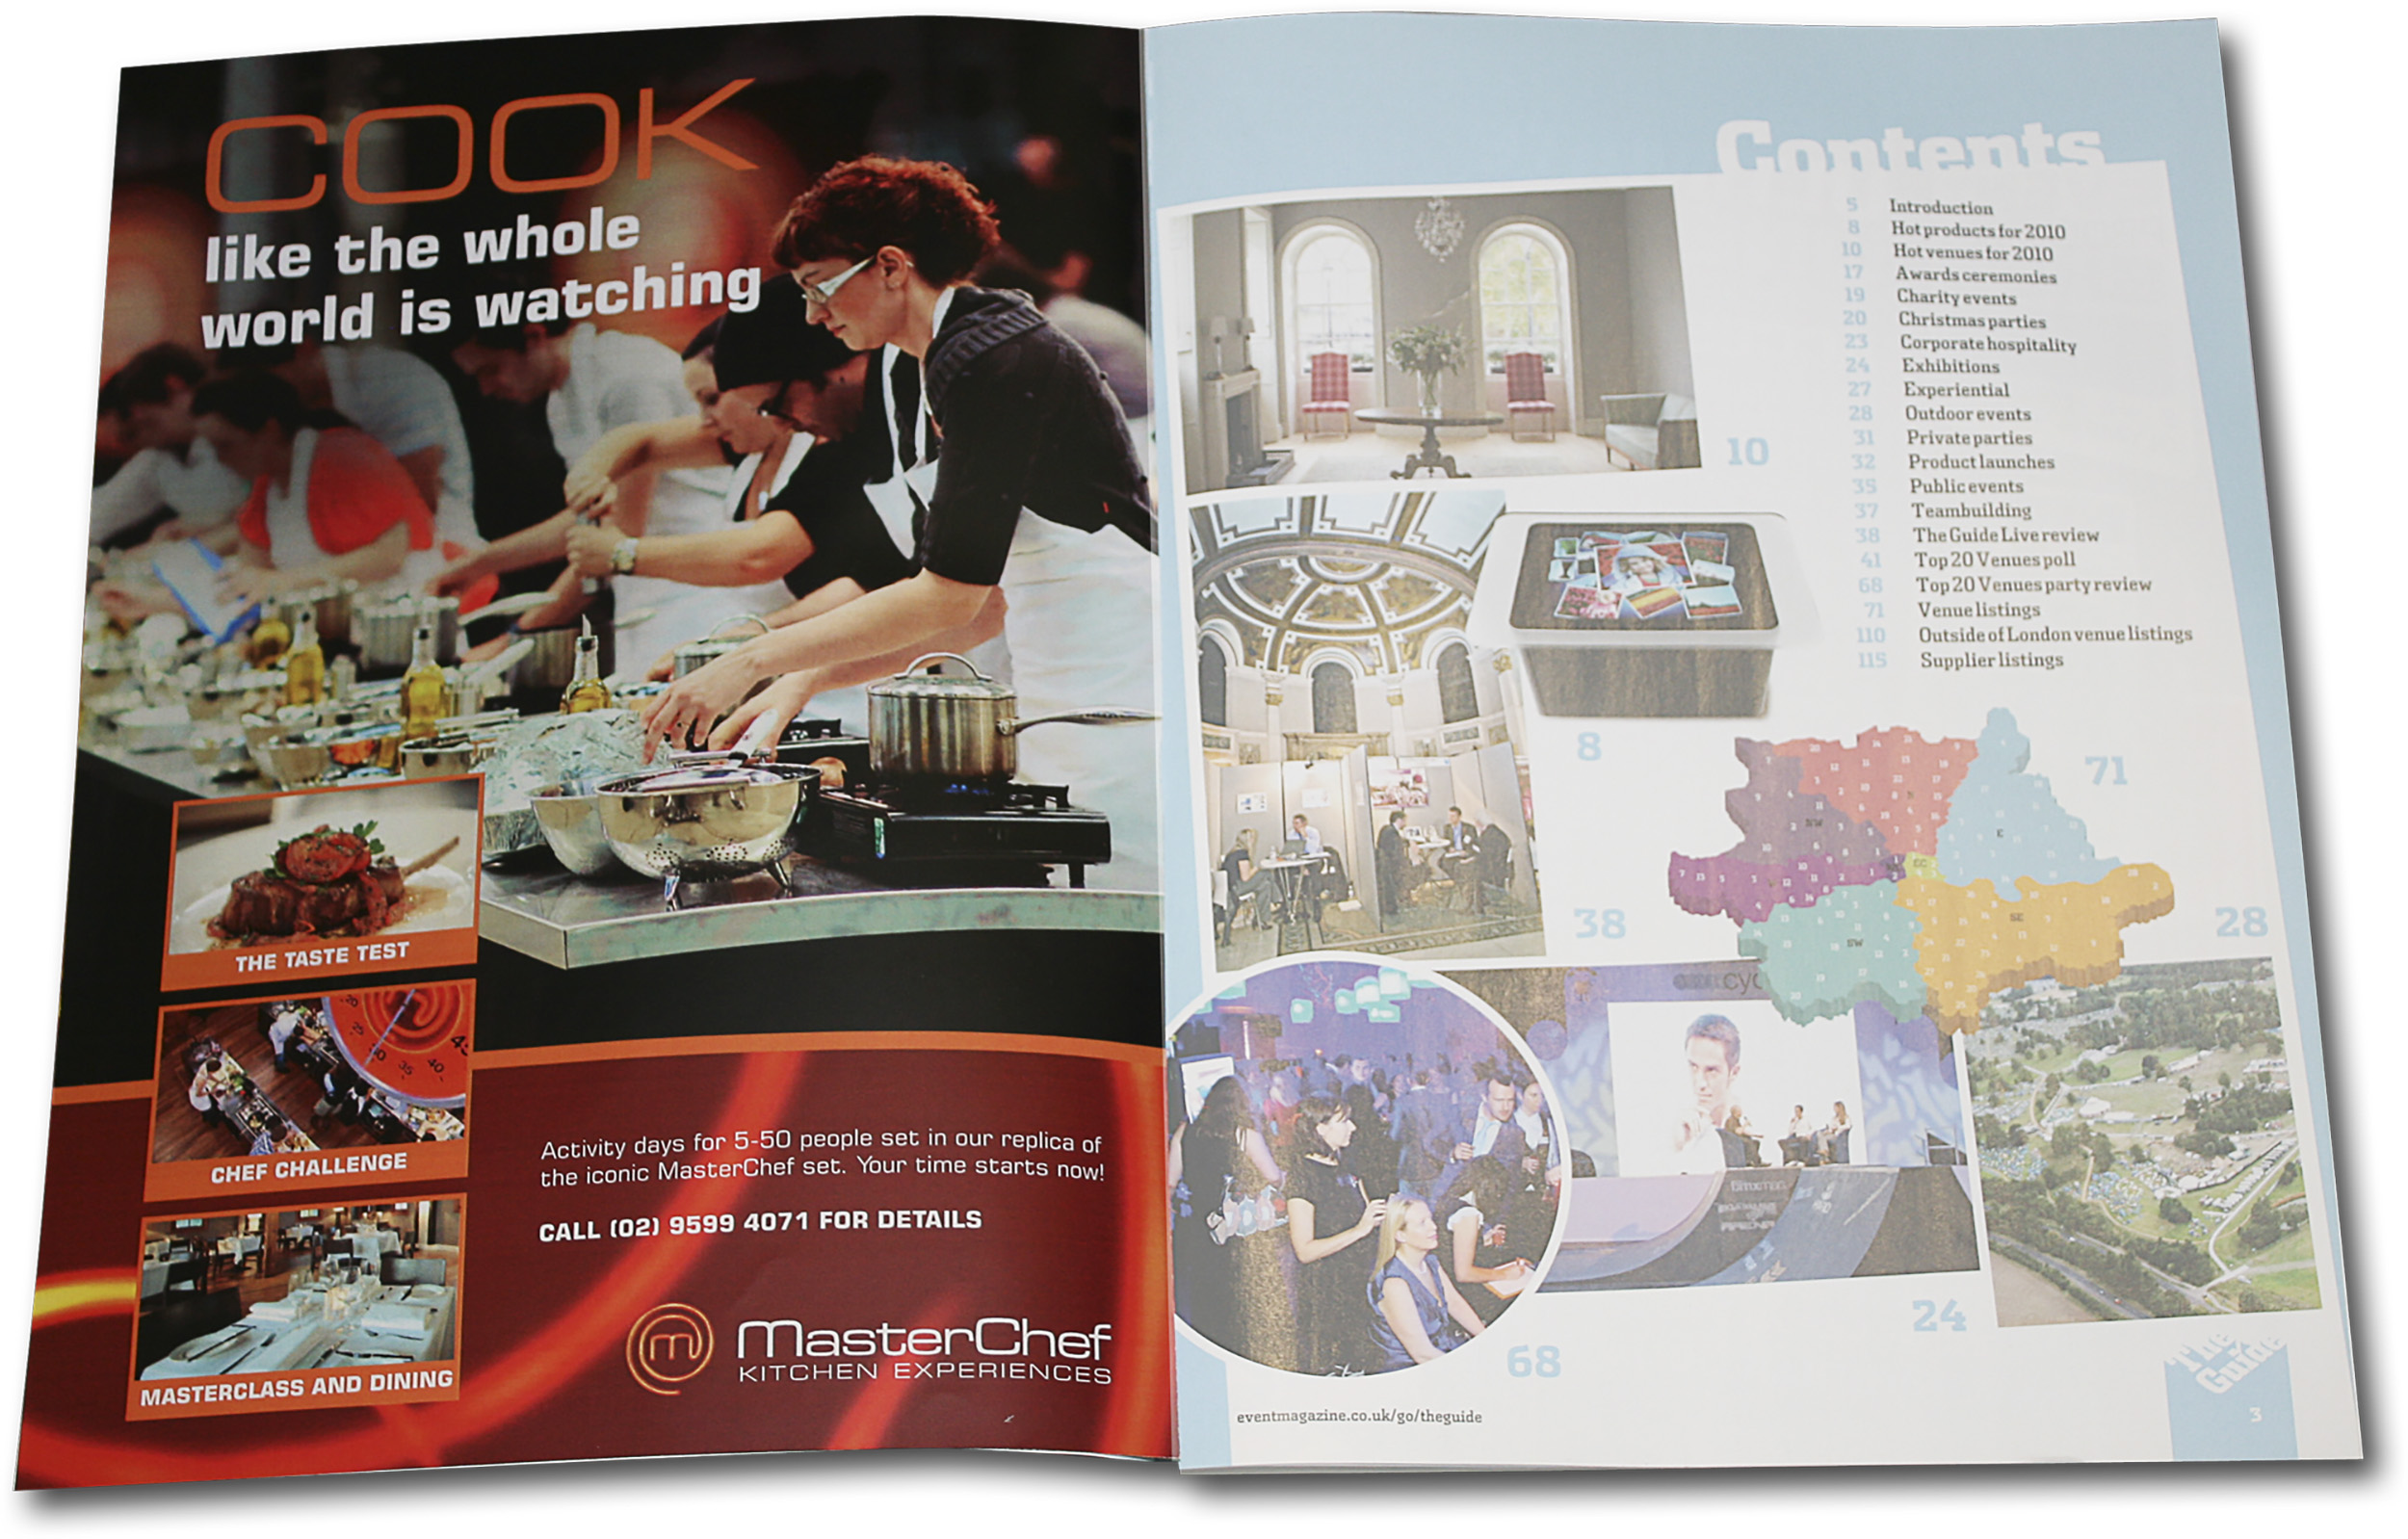 MasterChef Australia cooking classes advertising concept